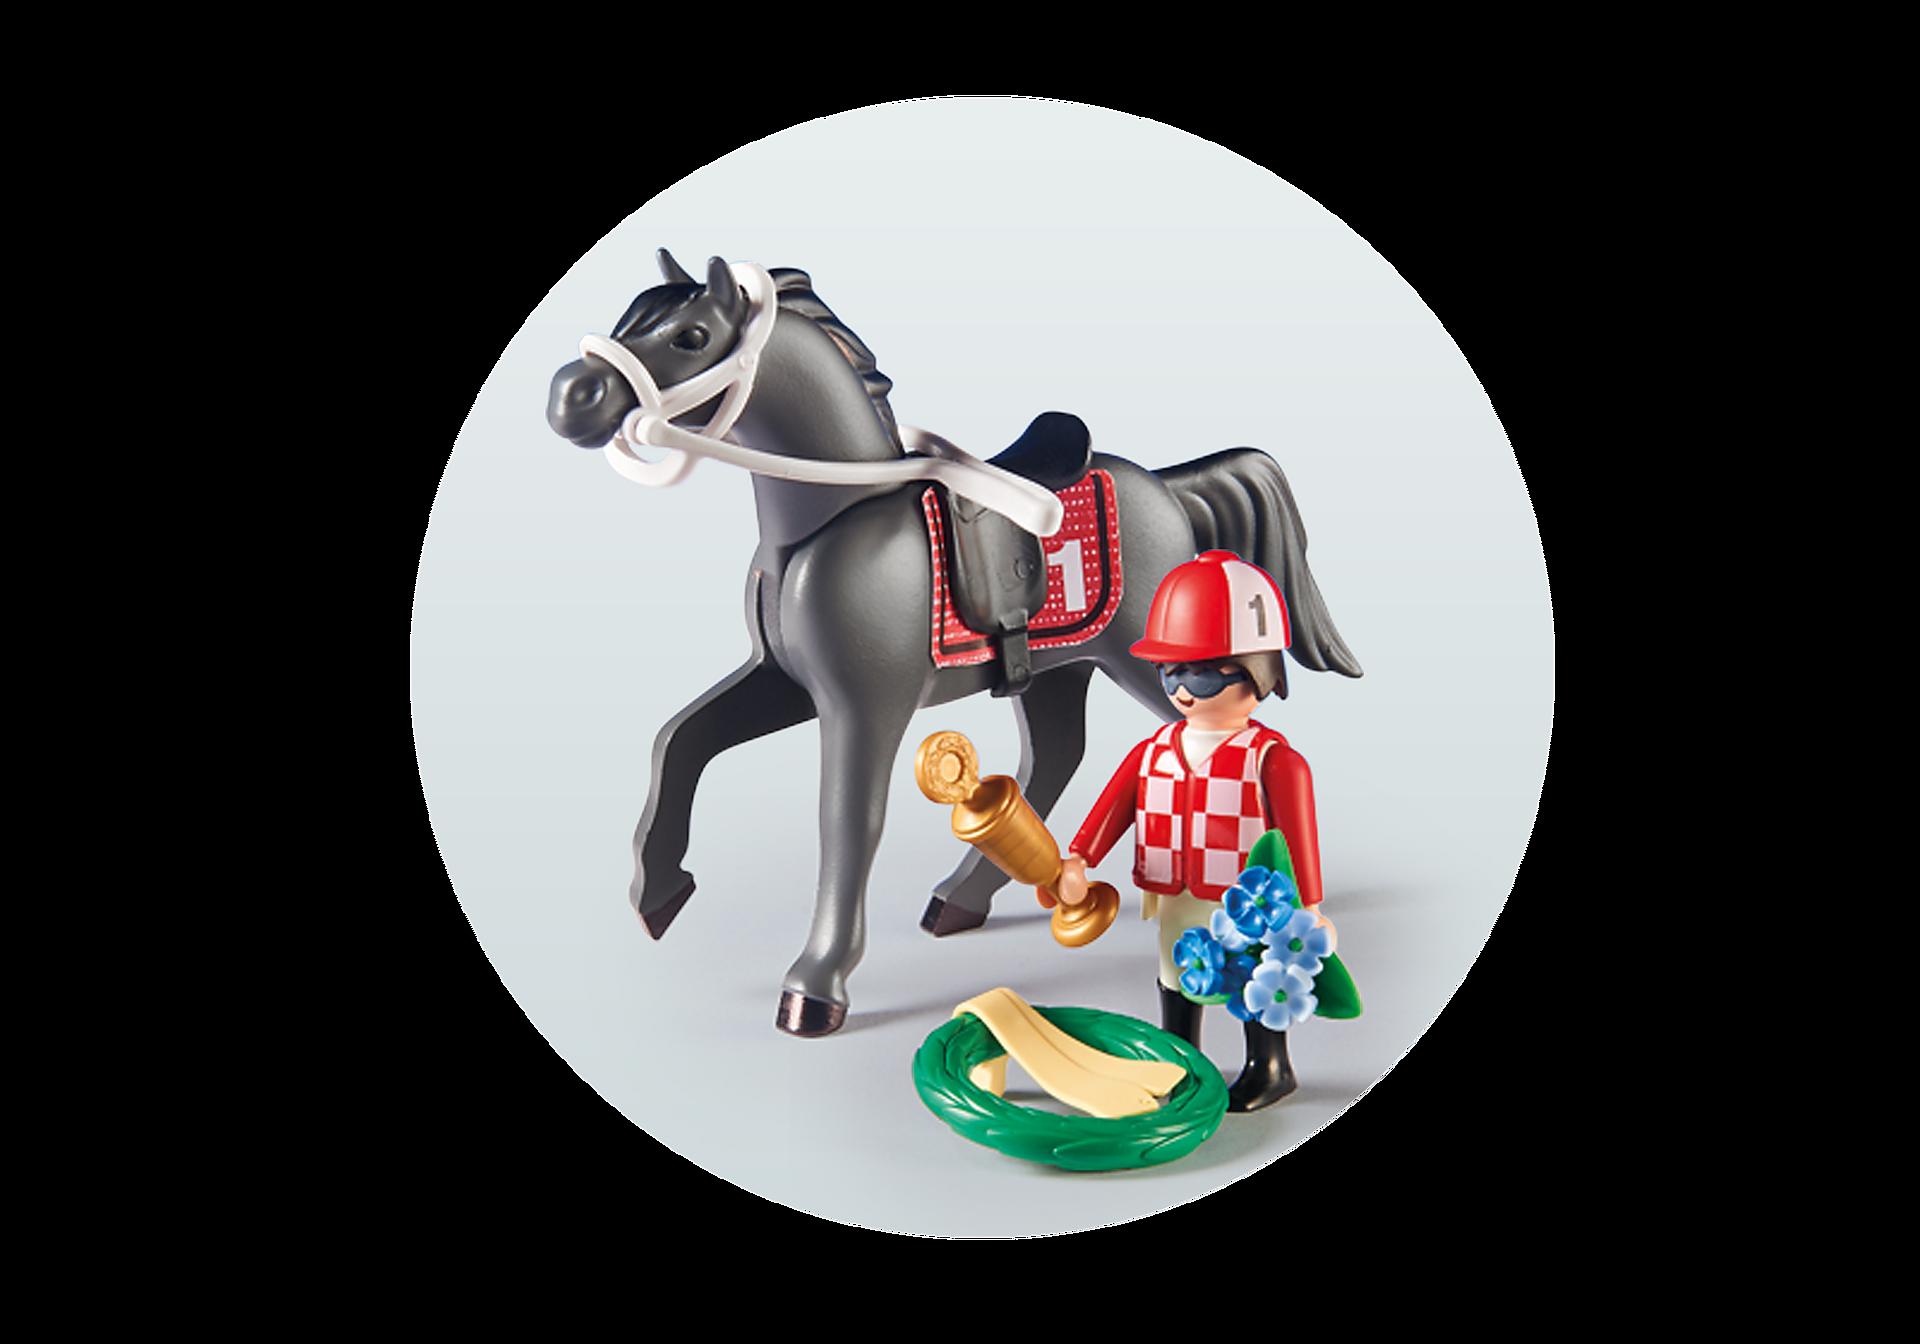 9261 Jockey avec cheval de course zoom image5